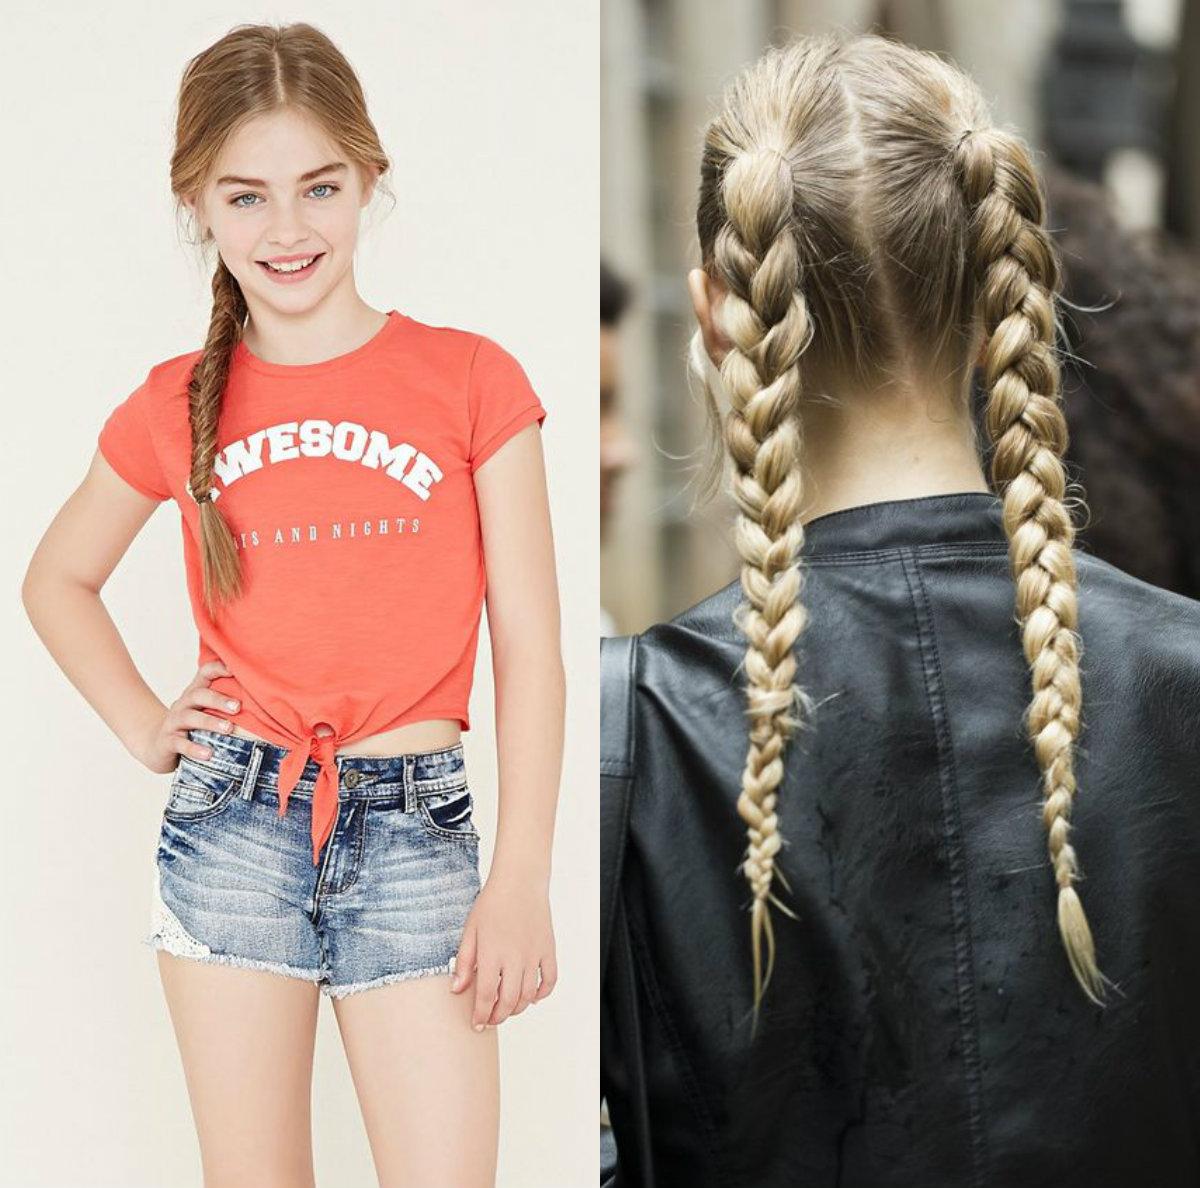 Penteados da moda para adolescentes no reino da moda